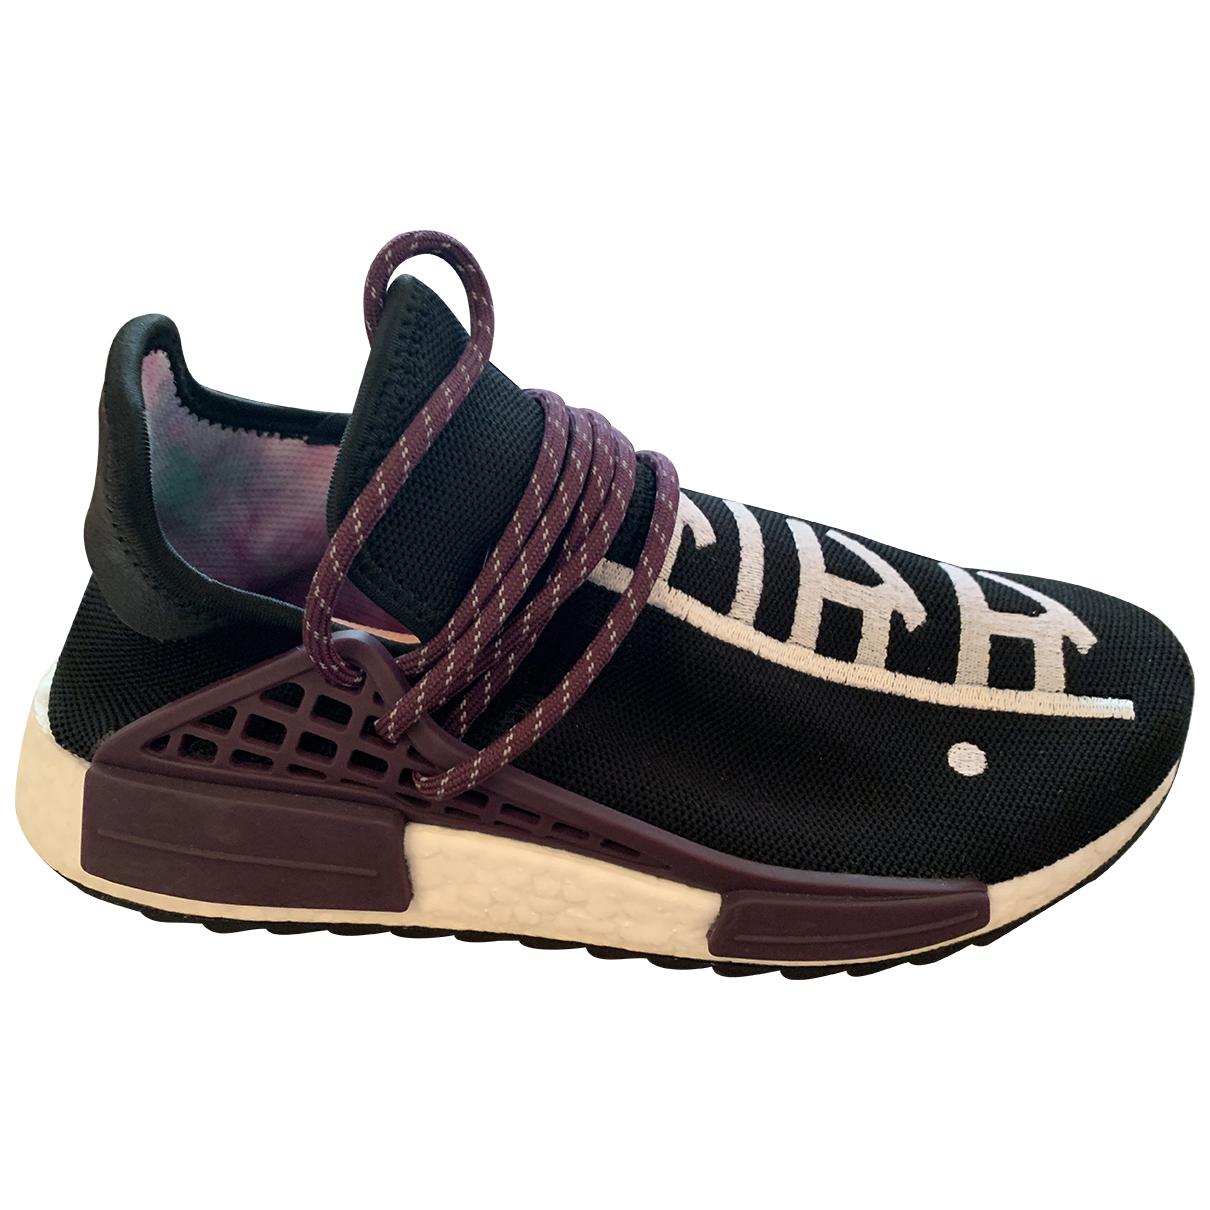 Adidas X Pharrell Williams - Baskets NMD Hu pour homme en toile - noir